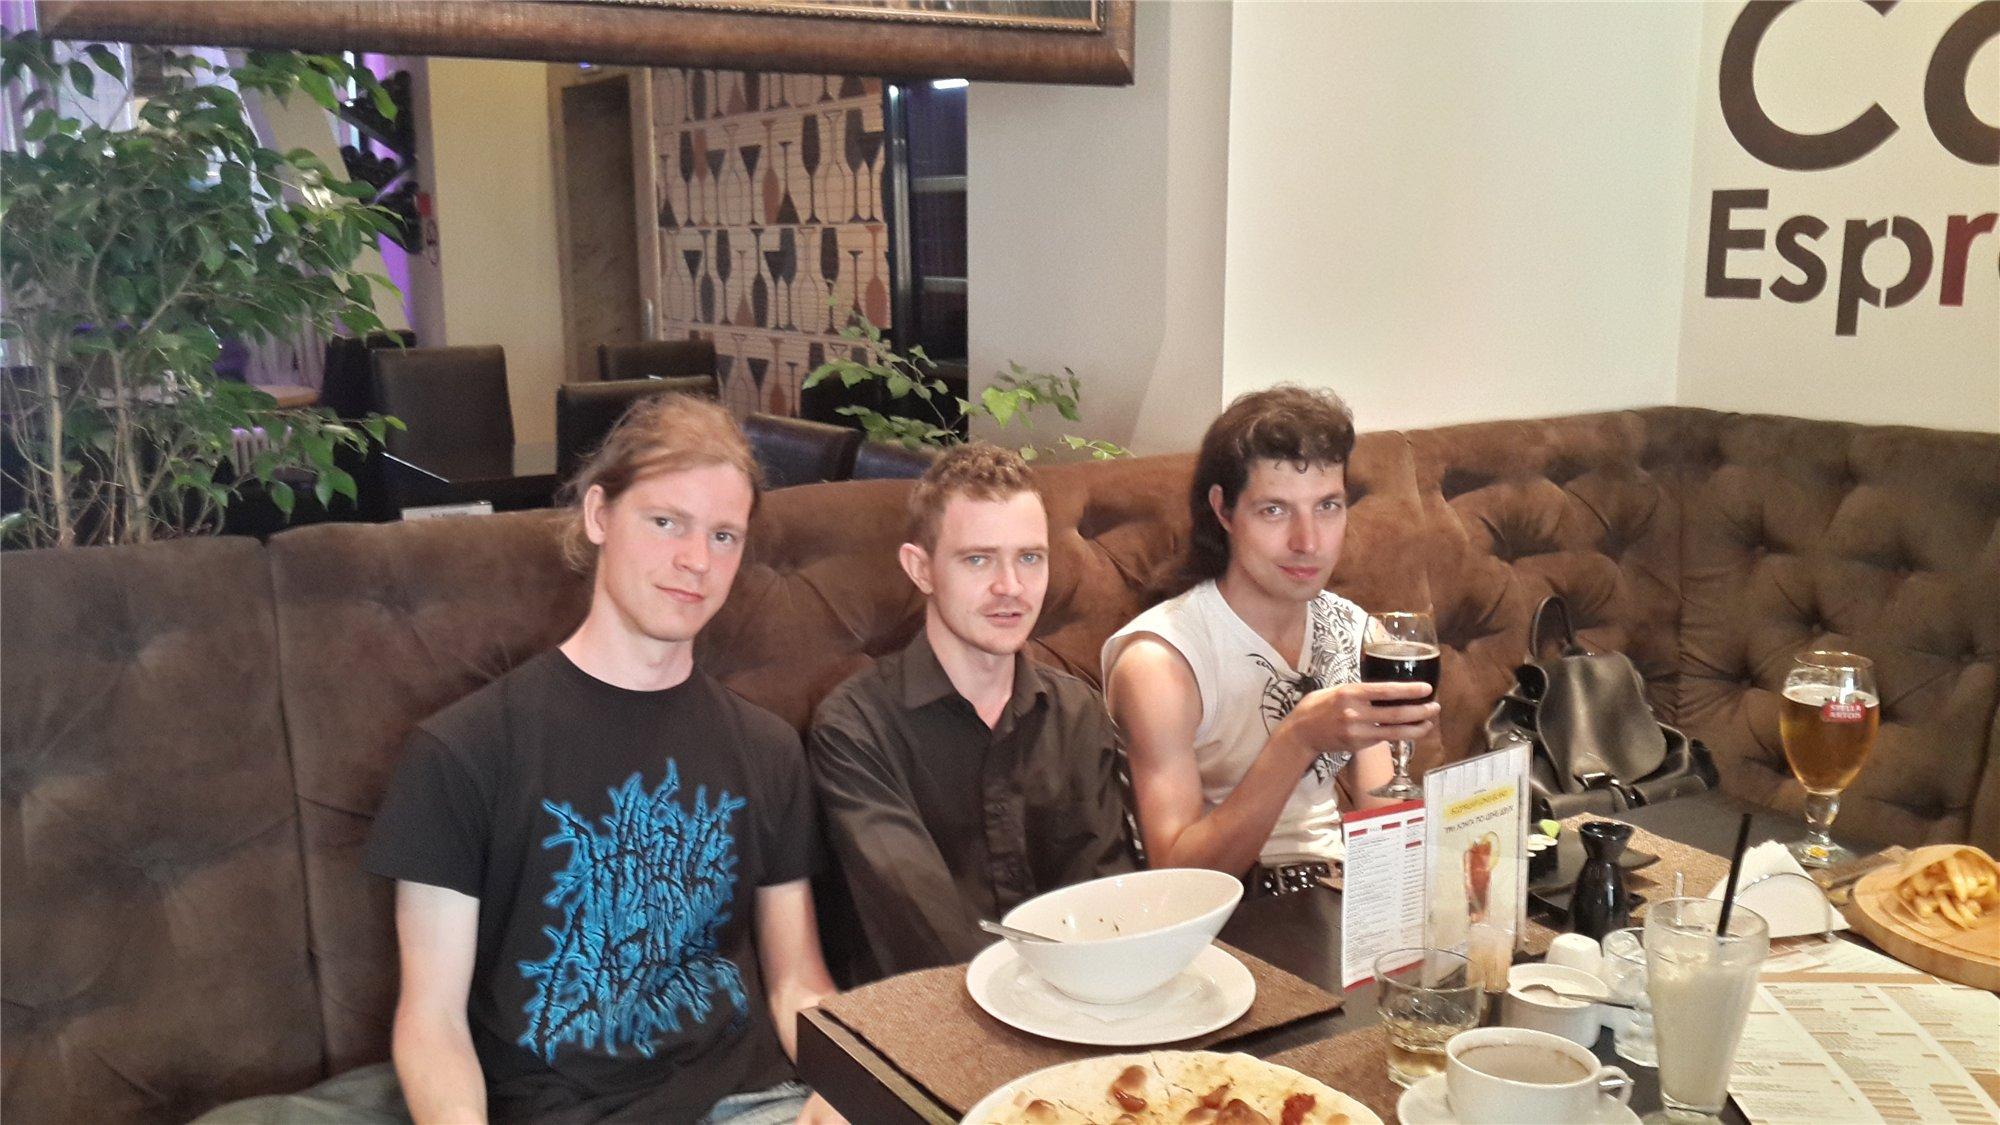 В баре, третий день. (слева направо) димаметал, Кориолан, Лэнс. Фотографирует - Александр...